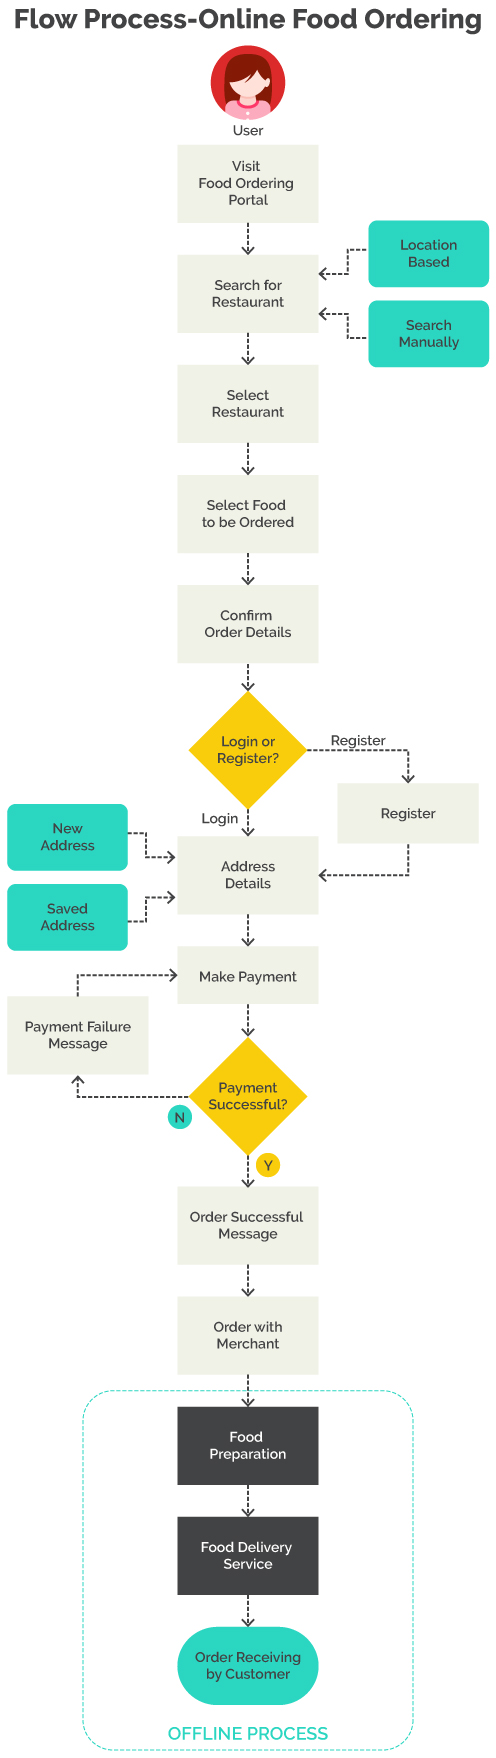 Process Flow of Online Food Ordering